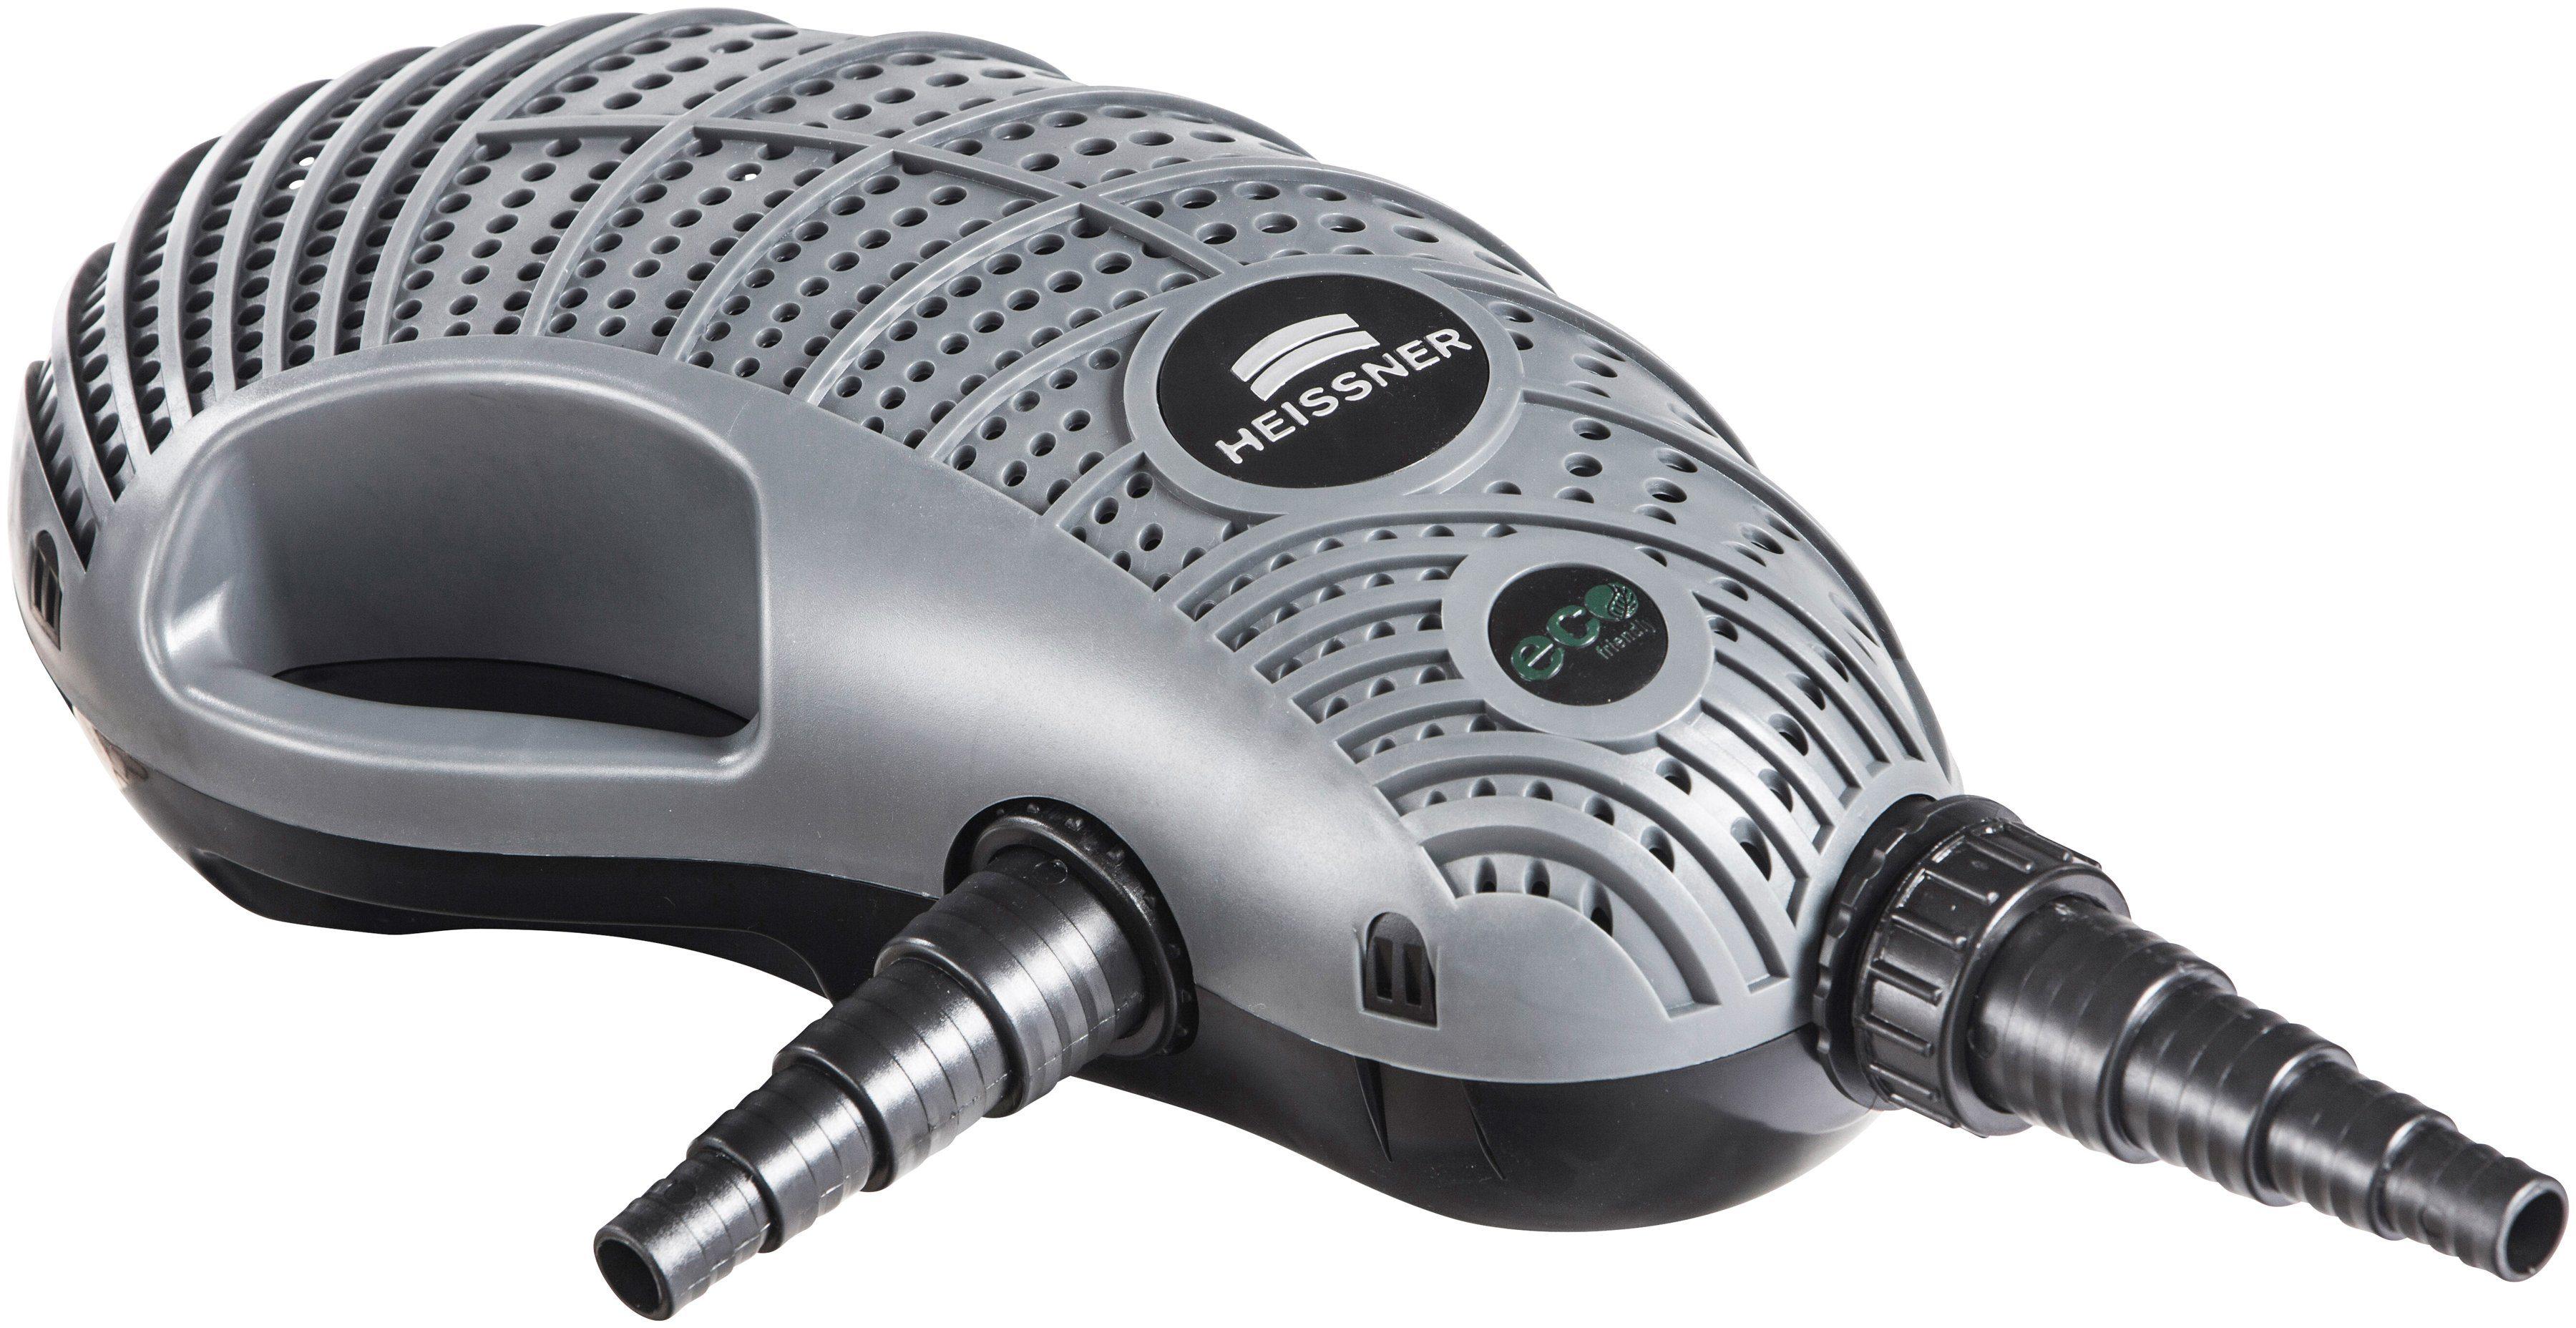 HEISSNER Filter- und Bachlaufpumpe »P6100E-00 AQUA CRAFT«, 6600 l/h